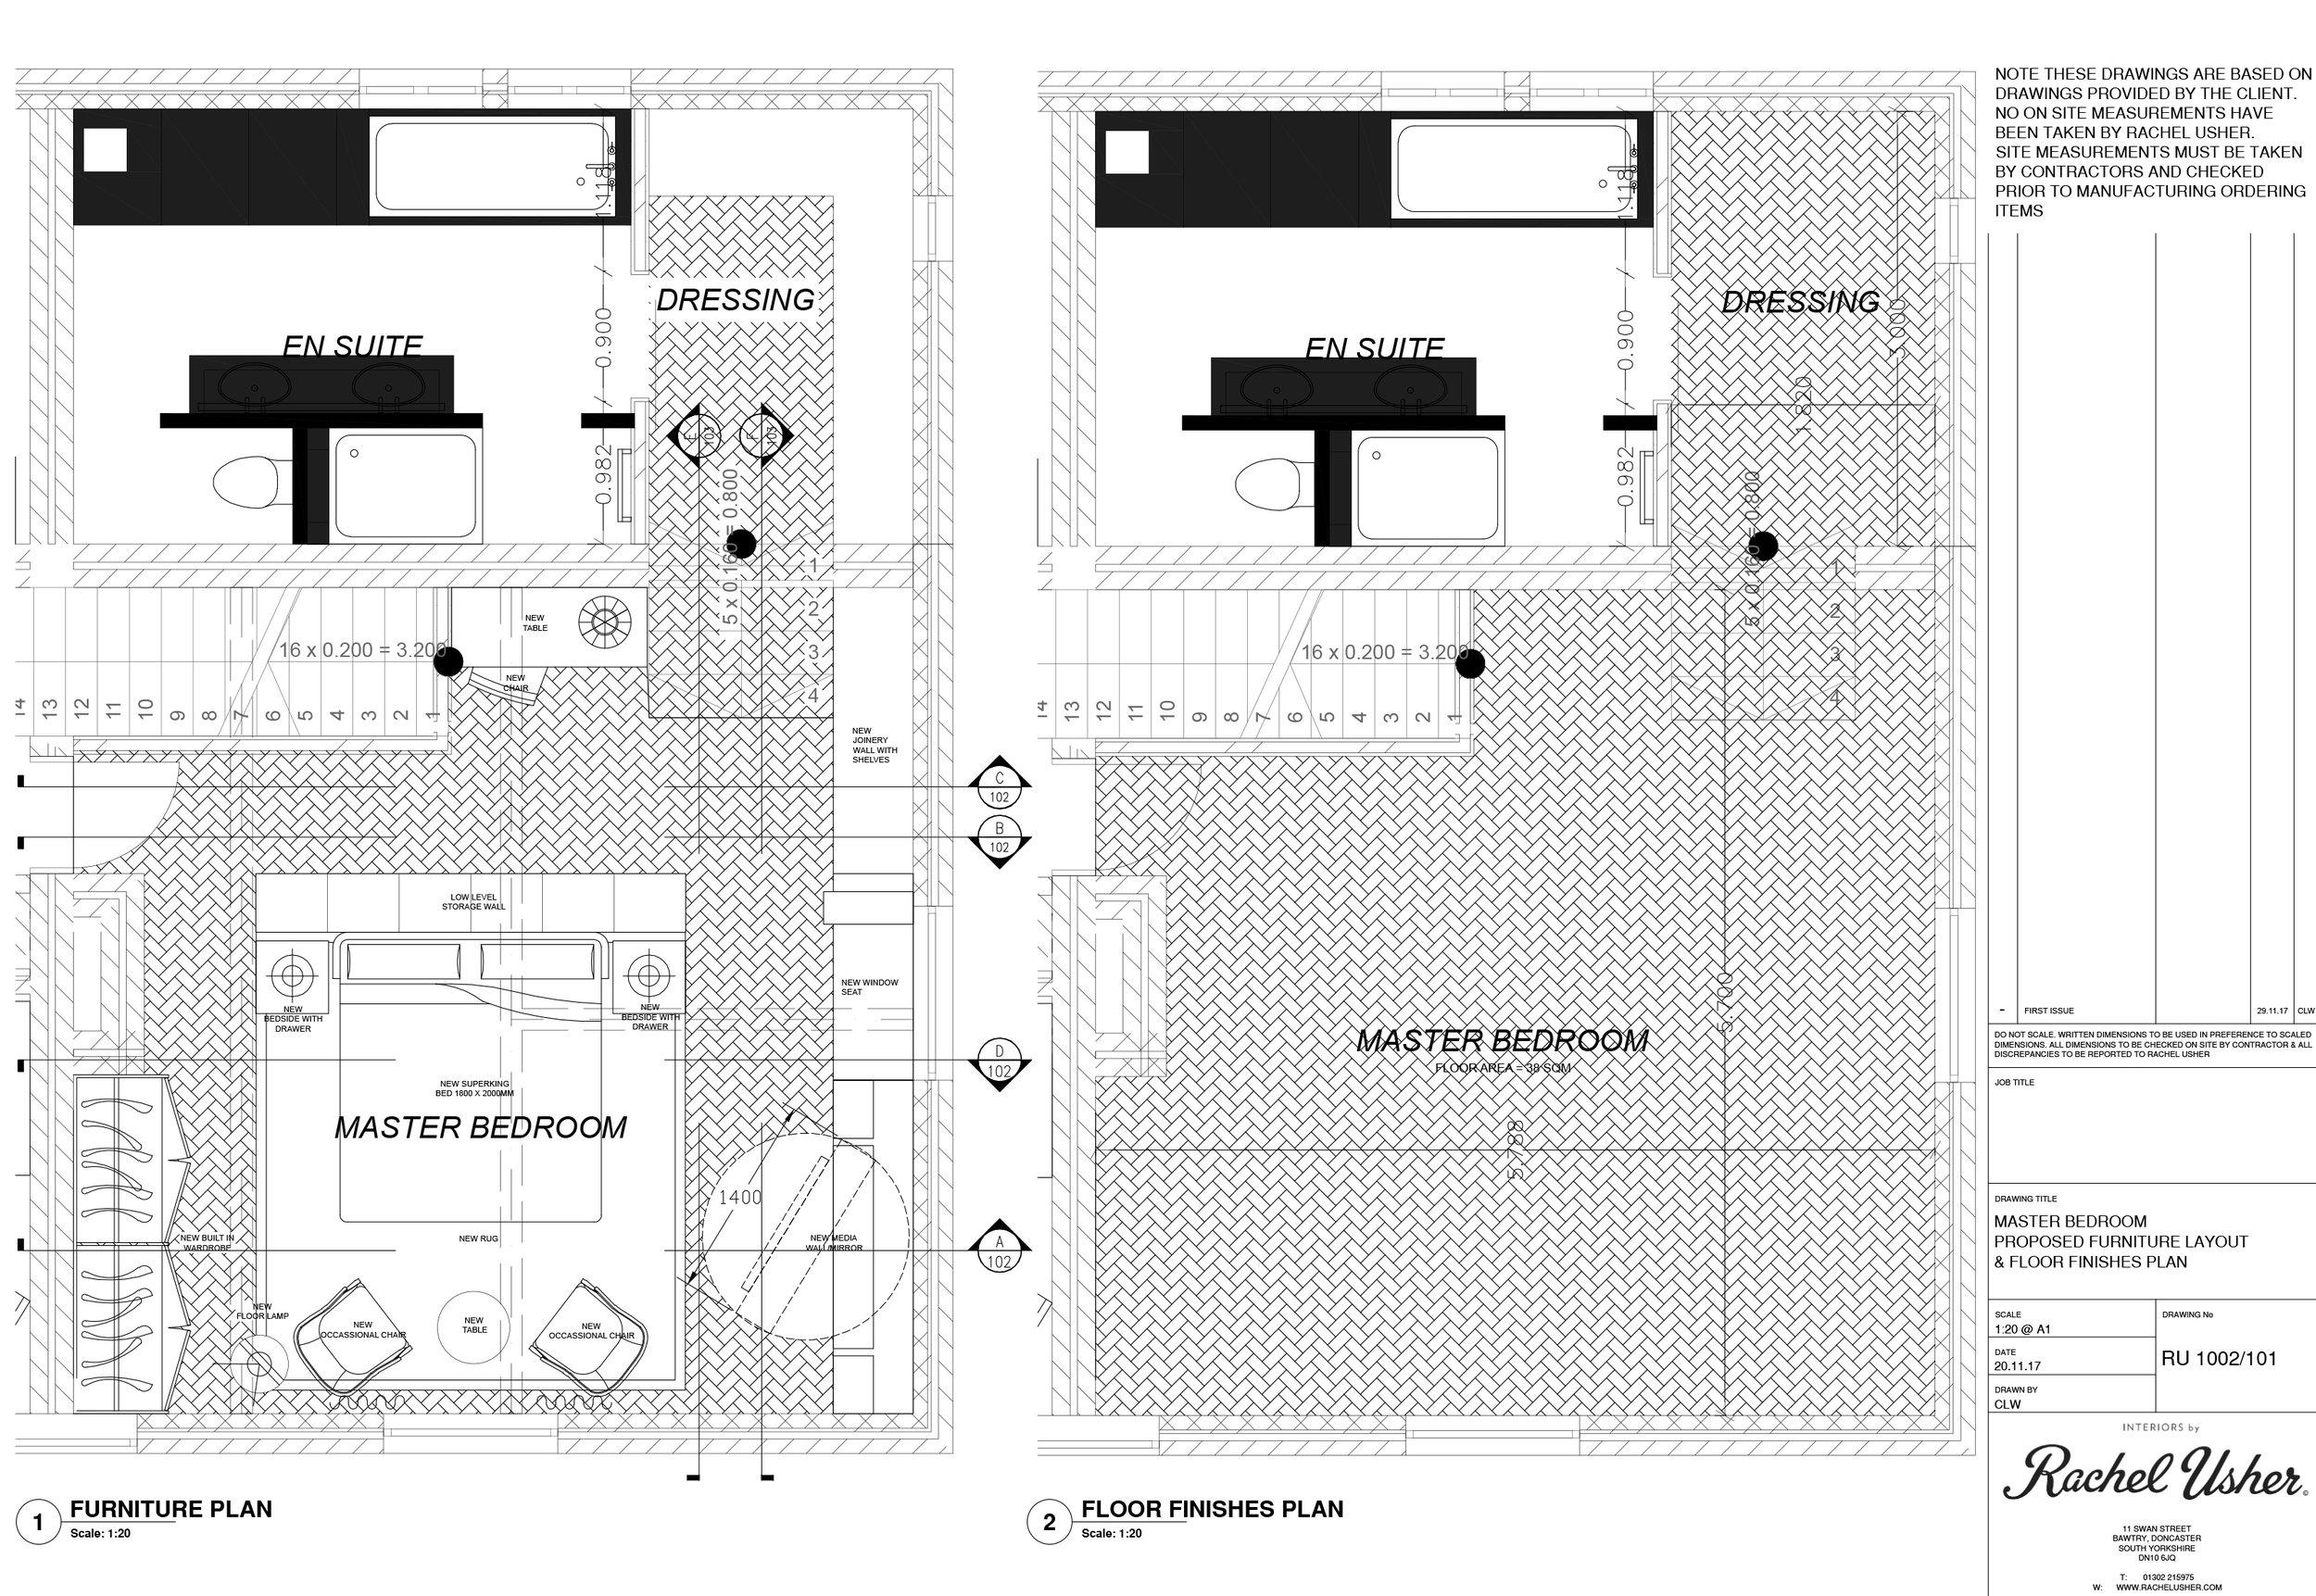 /Users/rachelusher/Documents/RU Residential/R002 Meadowside Cott